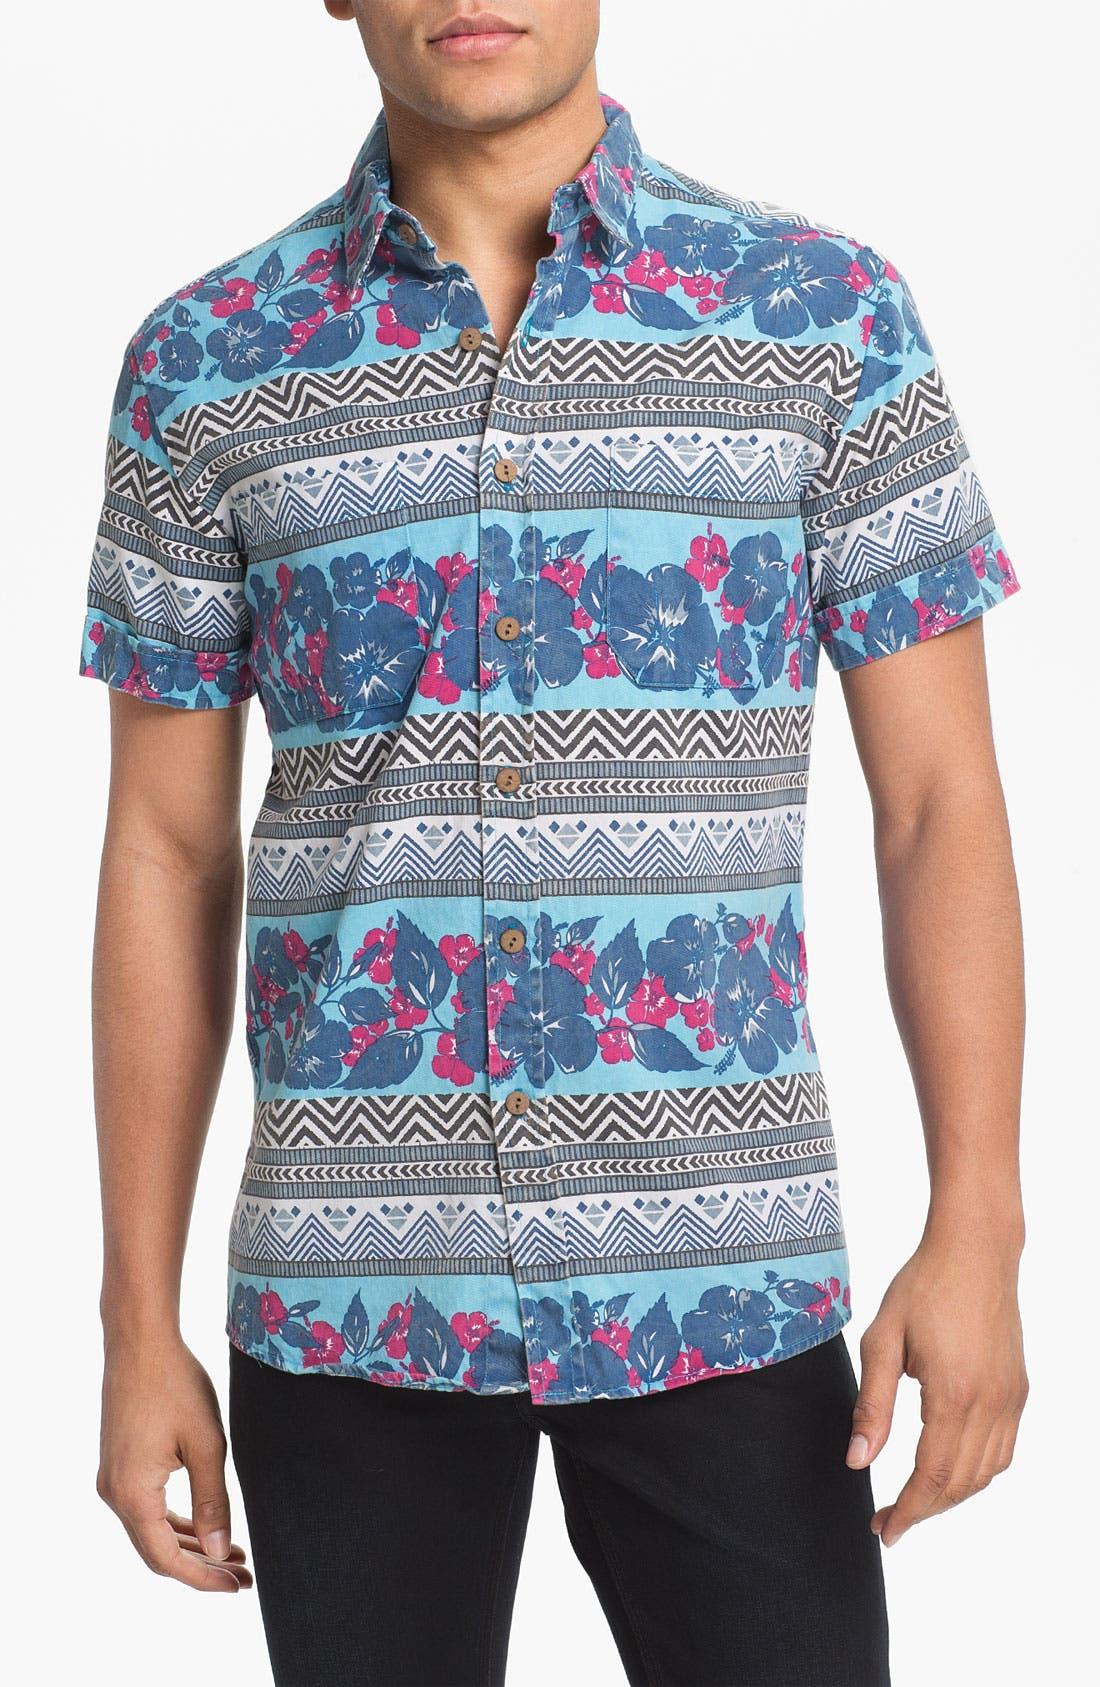 Alternate Image 1 Selected - Vanguard 'Tropical Pharaoh' Woven Shirt